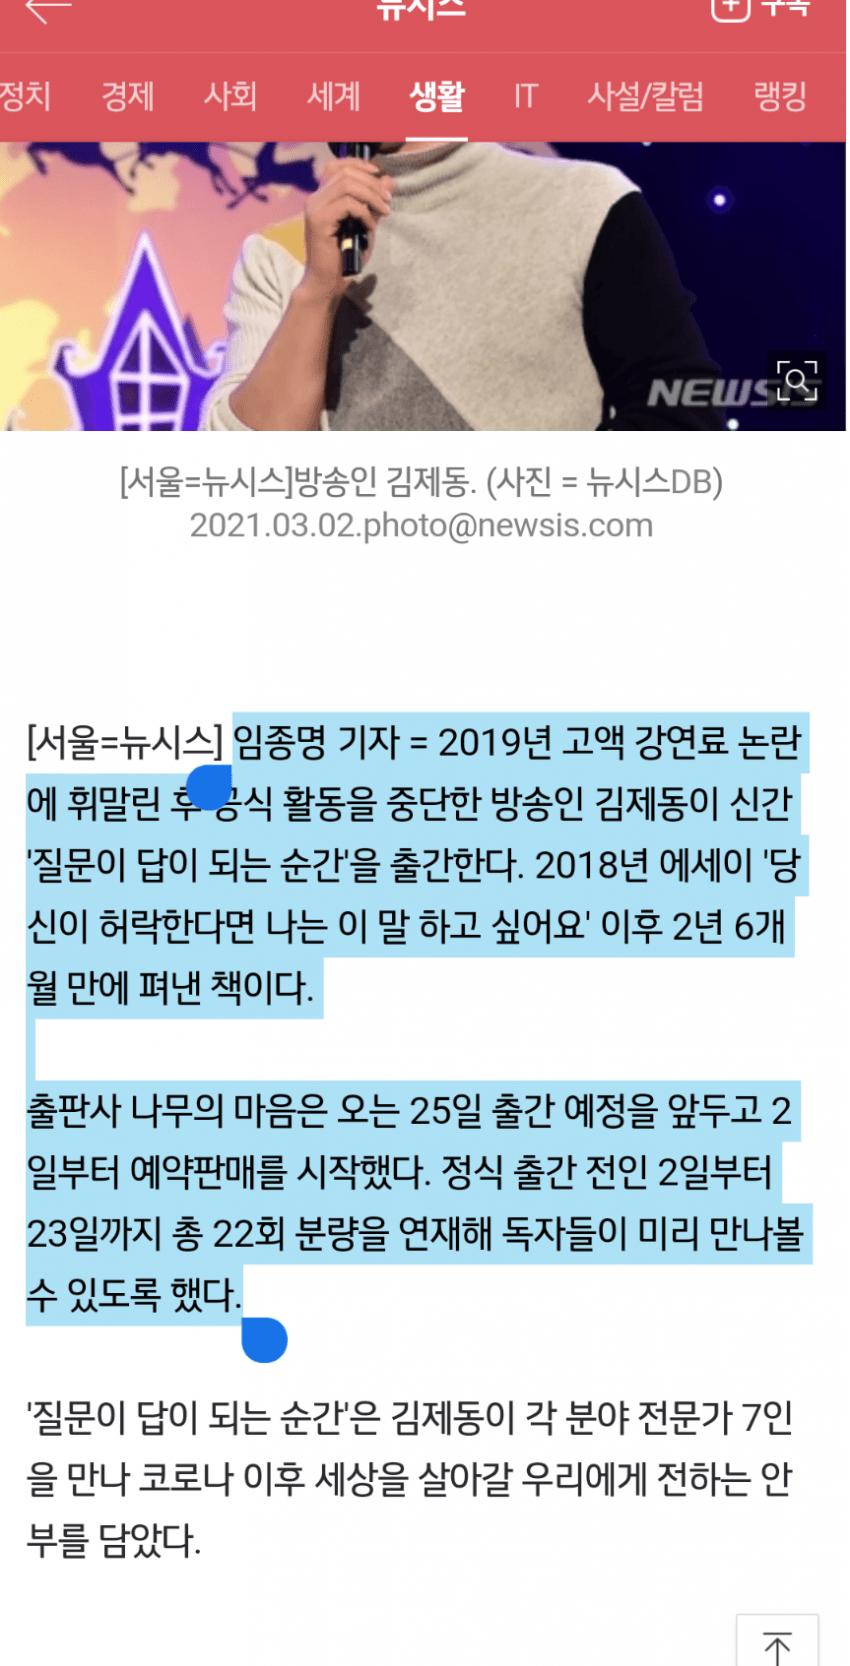 viewimage.php?id=2fbcc323e7d334aa51b1d3a24781&no=24b0d769e1d32ca73fec83fa11d02831682d835f2980fd236d5e1c9c2b1ddabc7f523a655c1ec8bb4b0dadf970a0fdee4a6cce77ab70c64b3b0424fc95183bf15c4c82554fbff6b6ca9356f75990f66f4259338836b45b173033f2460f6896ef29071255328cf75f7ff748fe73e566d0954e99bdfc96